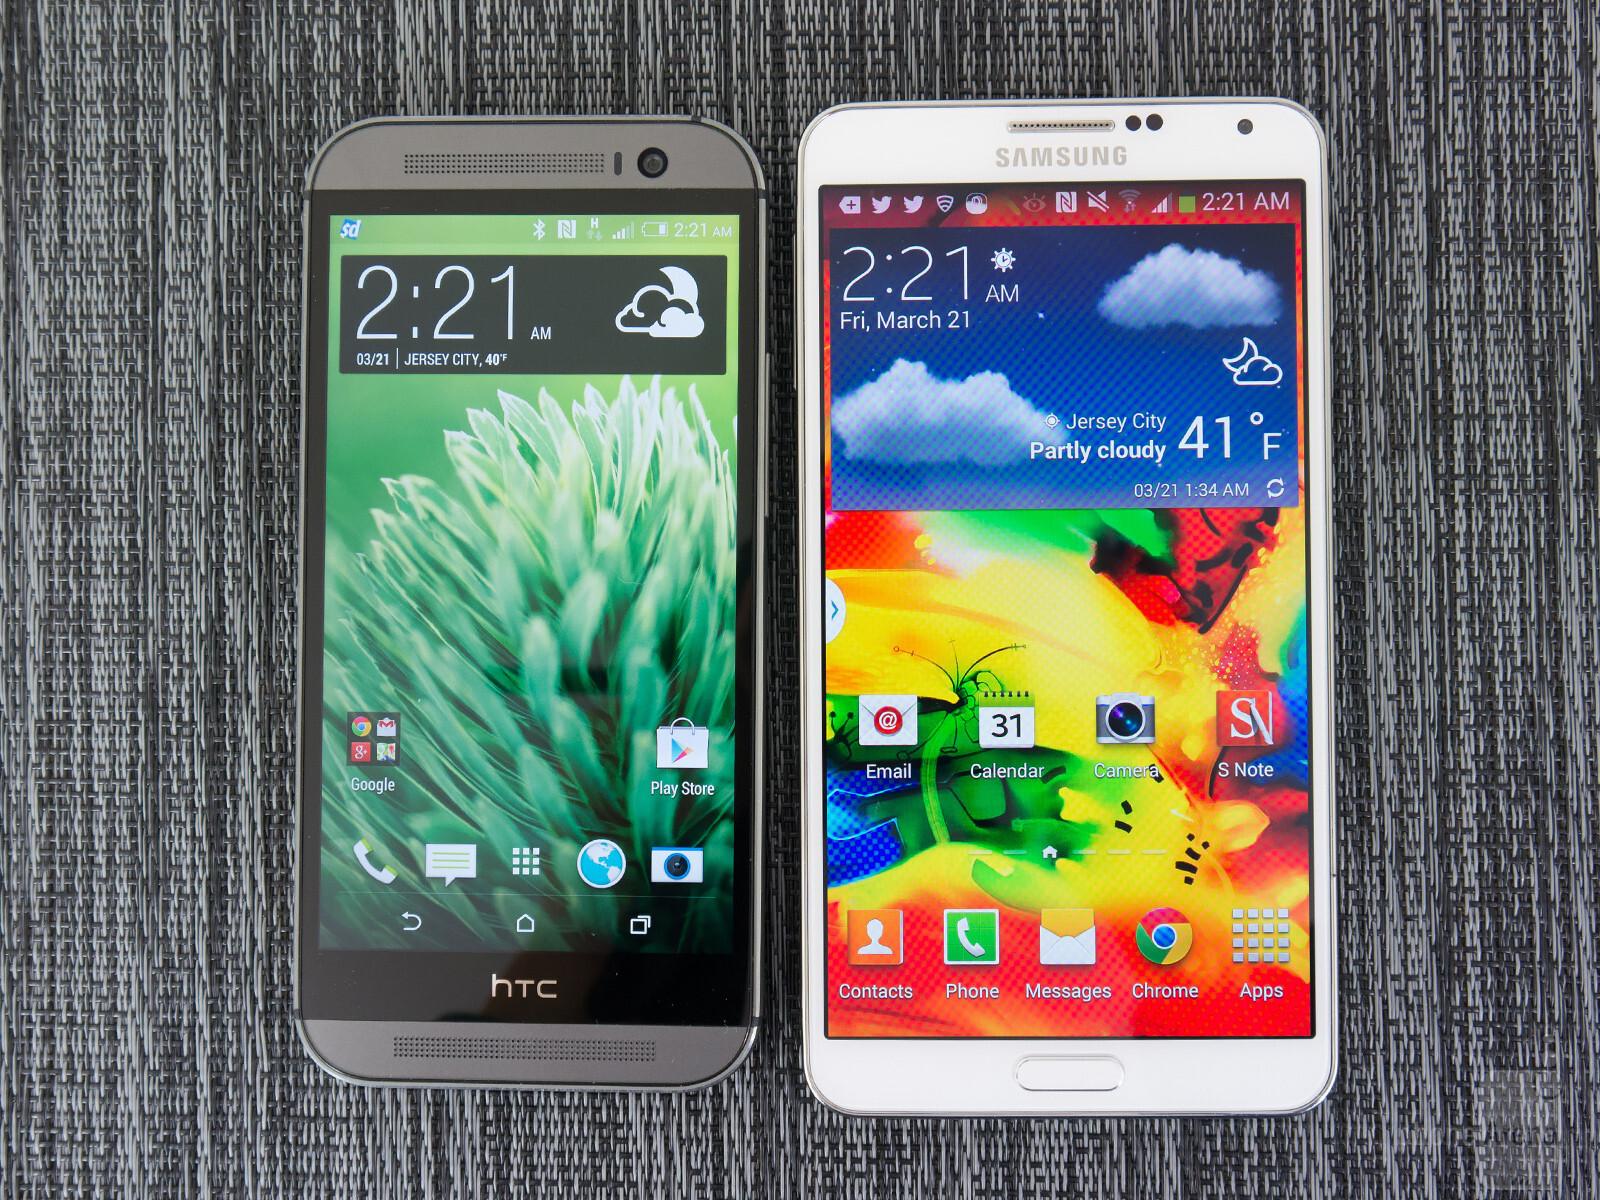 Samsung galaxy note 5 vs htc one m9 plus a comparison - Samsung Galaxy Note 5 Vs Htc One M9 Plus A Comparison 45